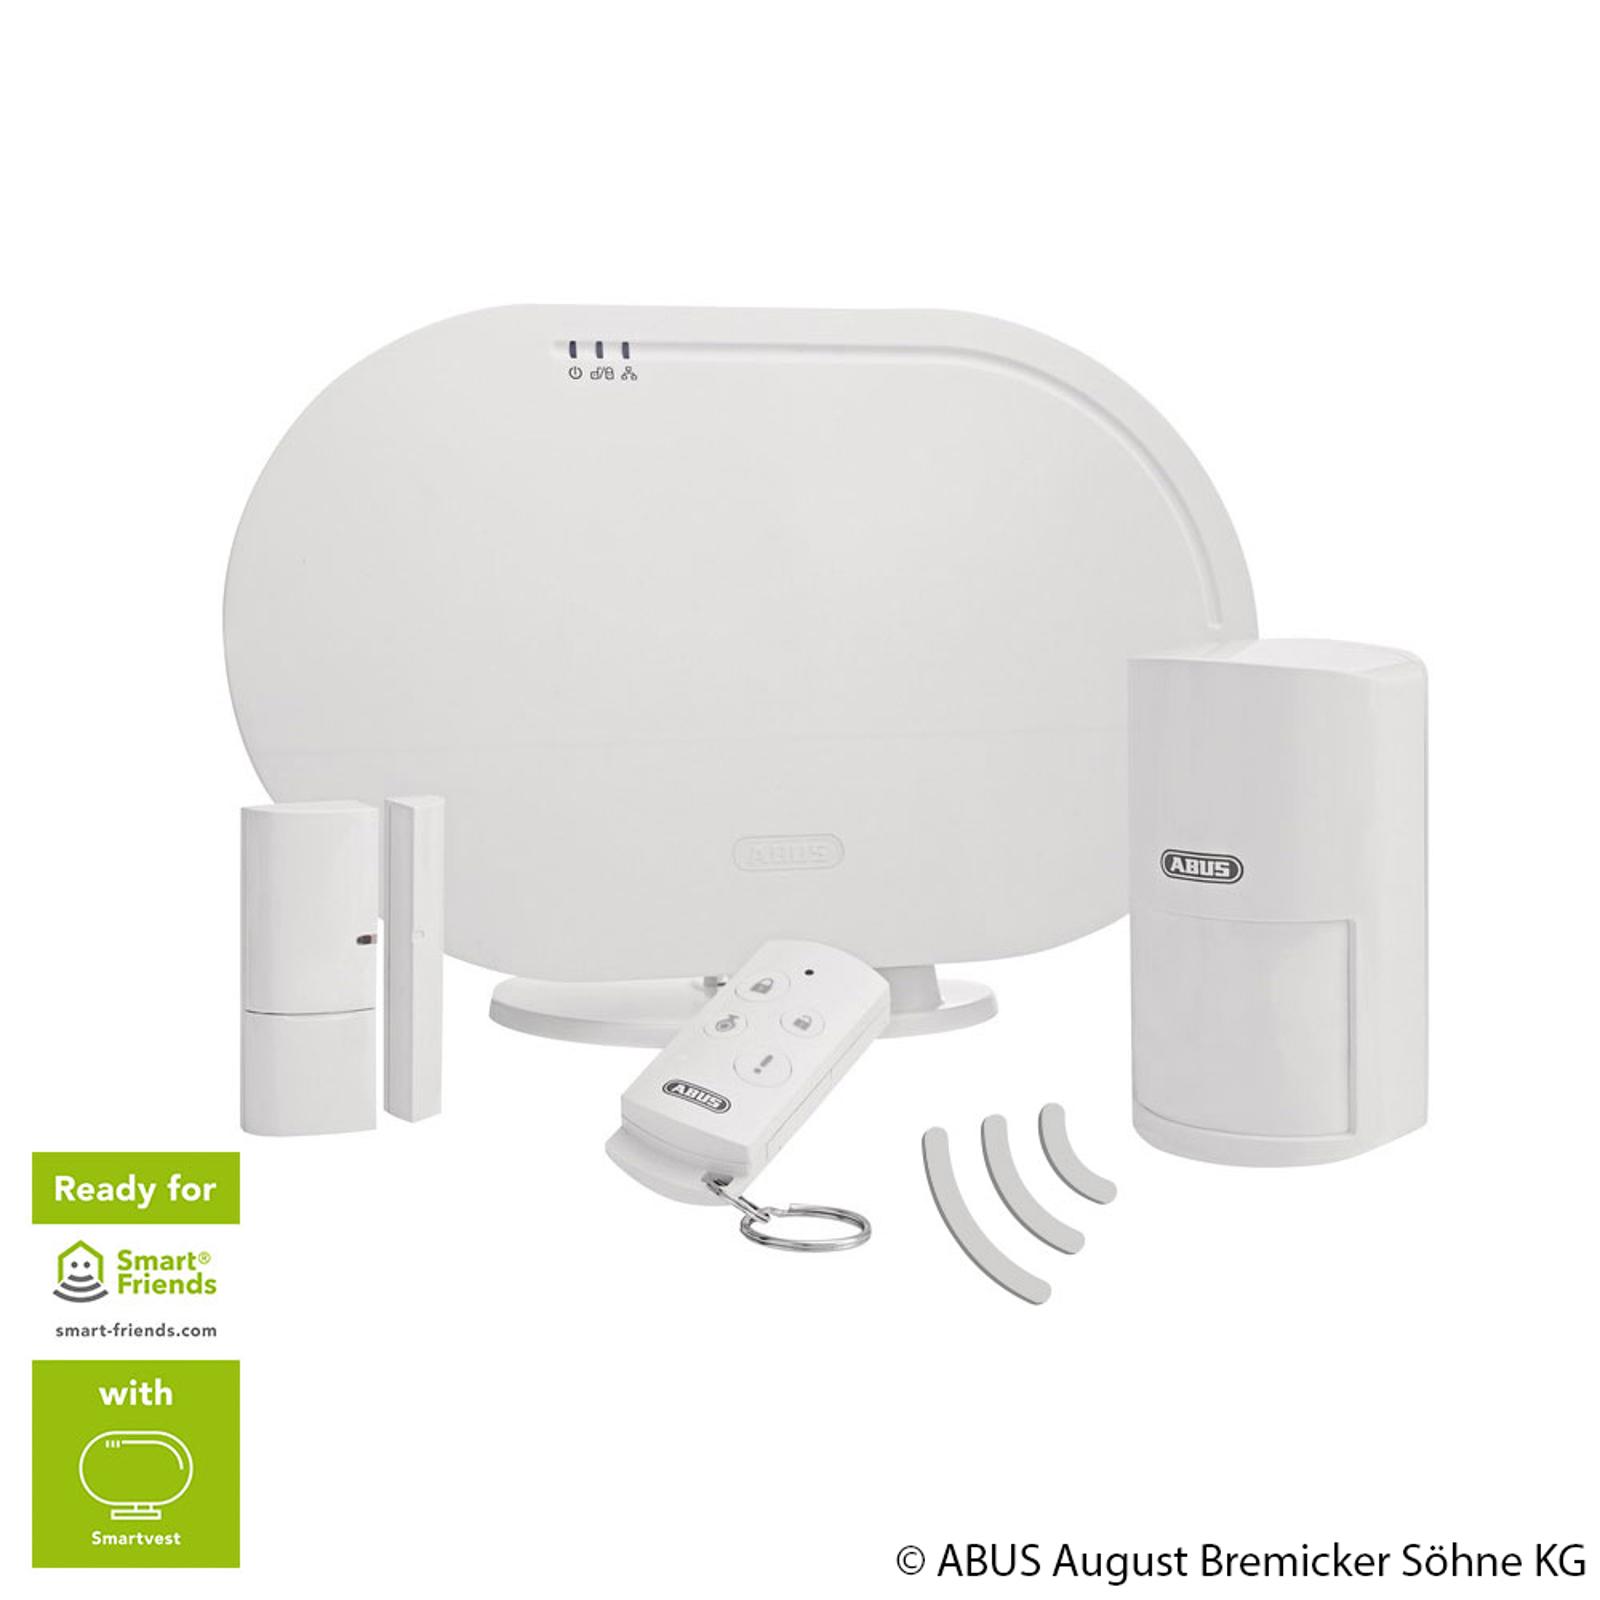 ABUS Smartvest Funk-Alarmanlage Basis-Set